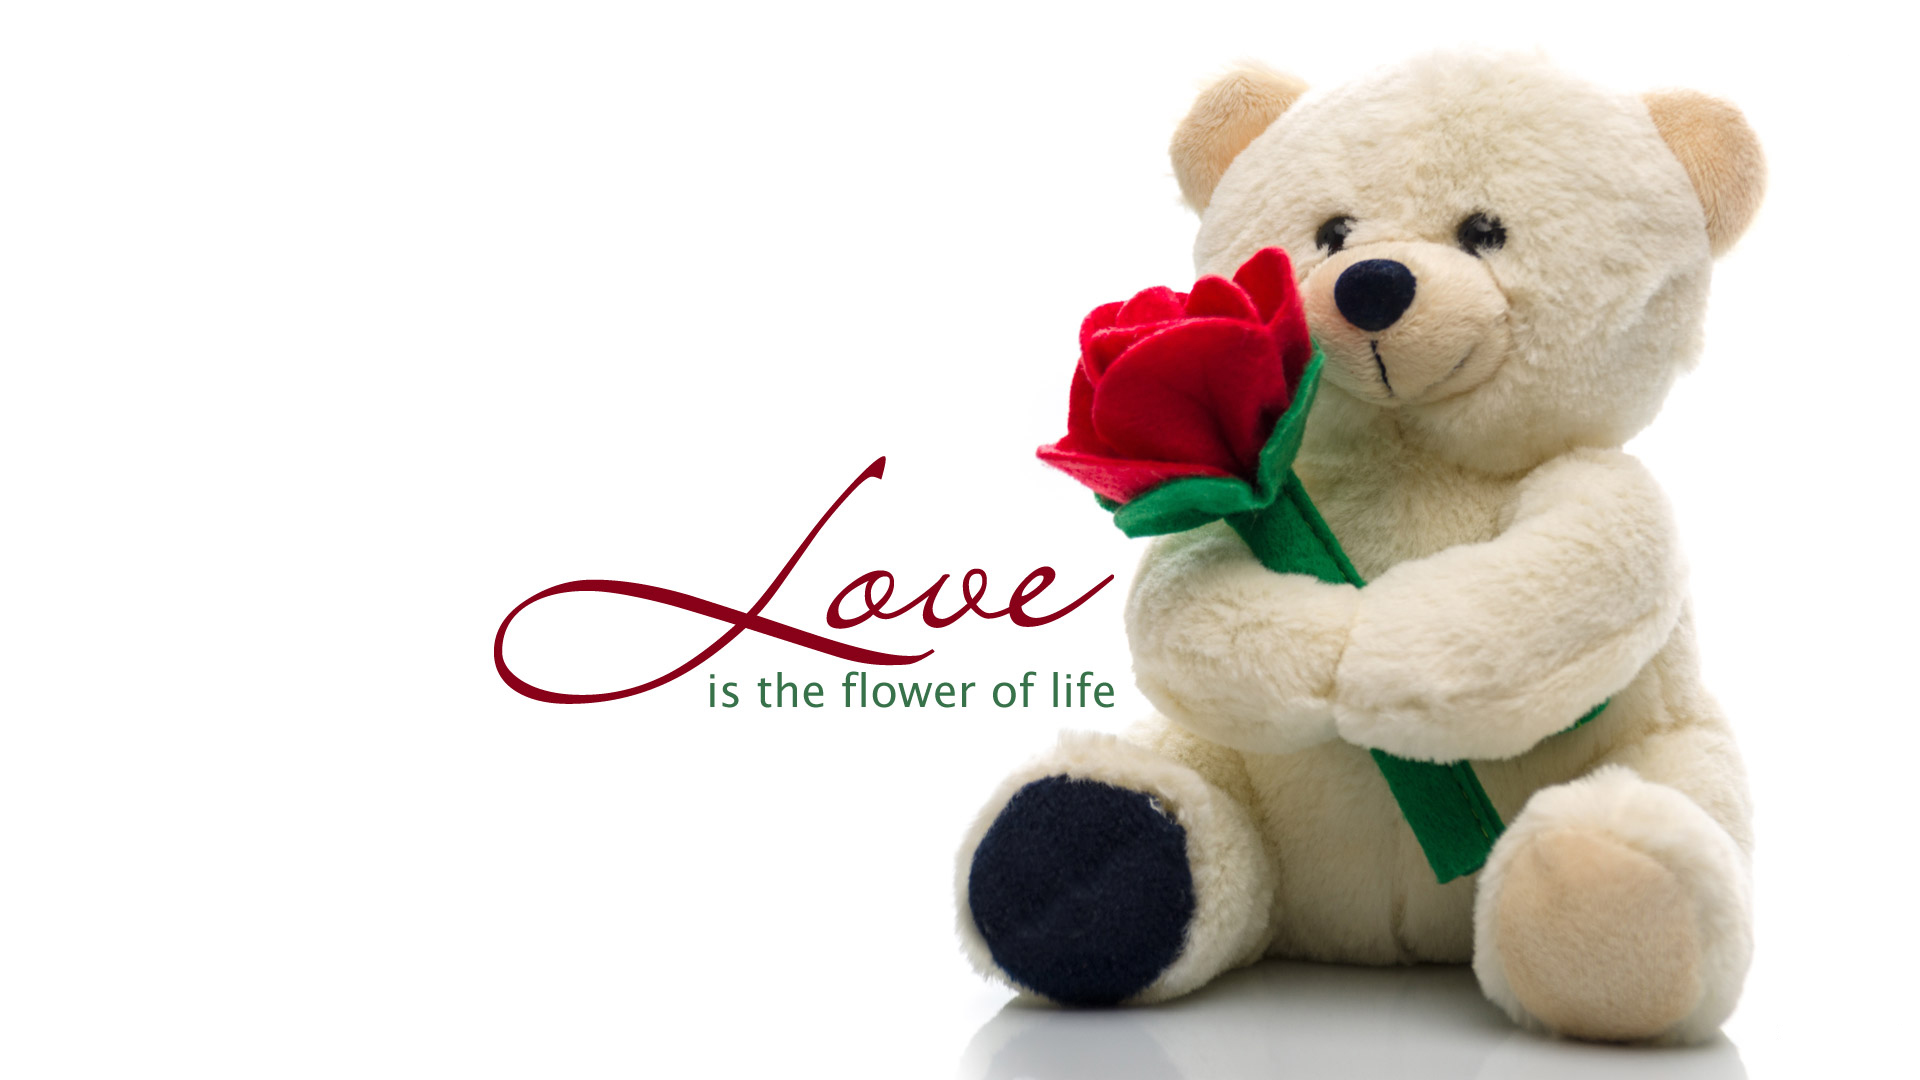 Cute Teddy Bear Love